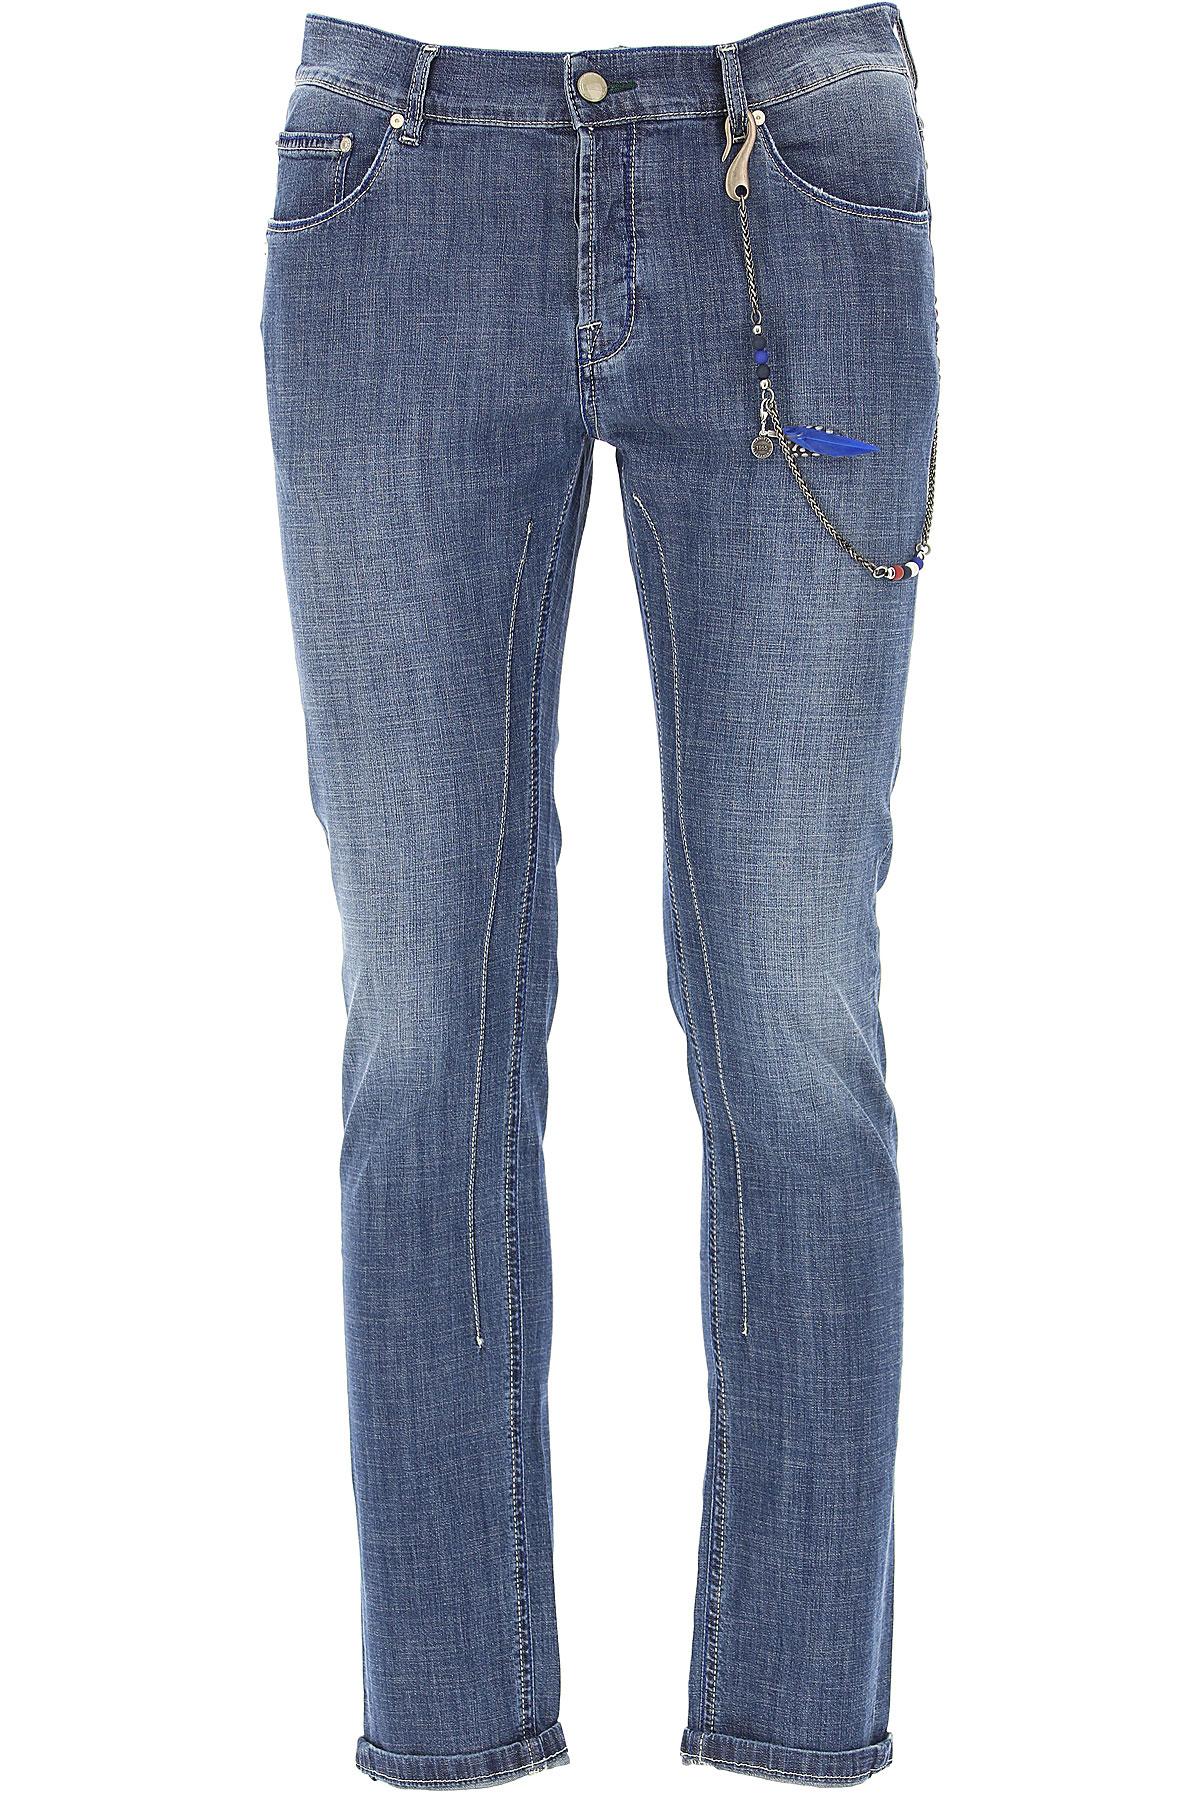 Daniele Alessandrini Jeans, Denim Blue, Cotton, 2017, 31 32 33 34 36